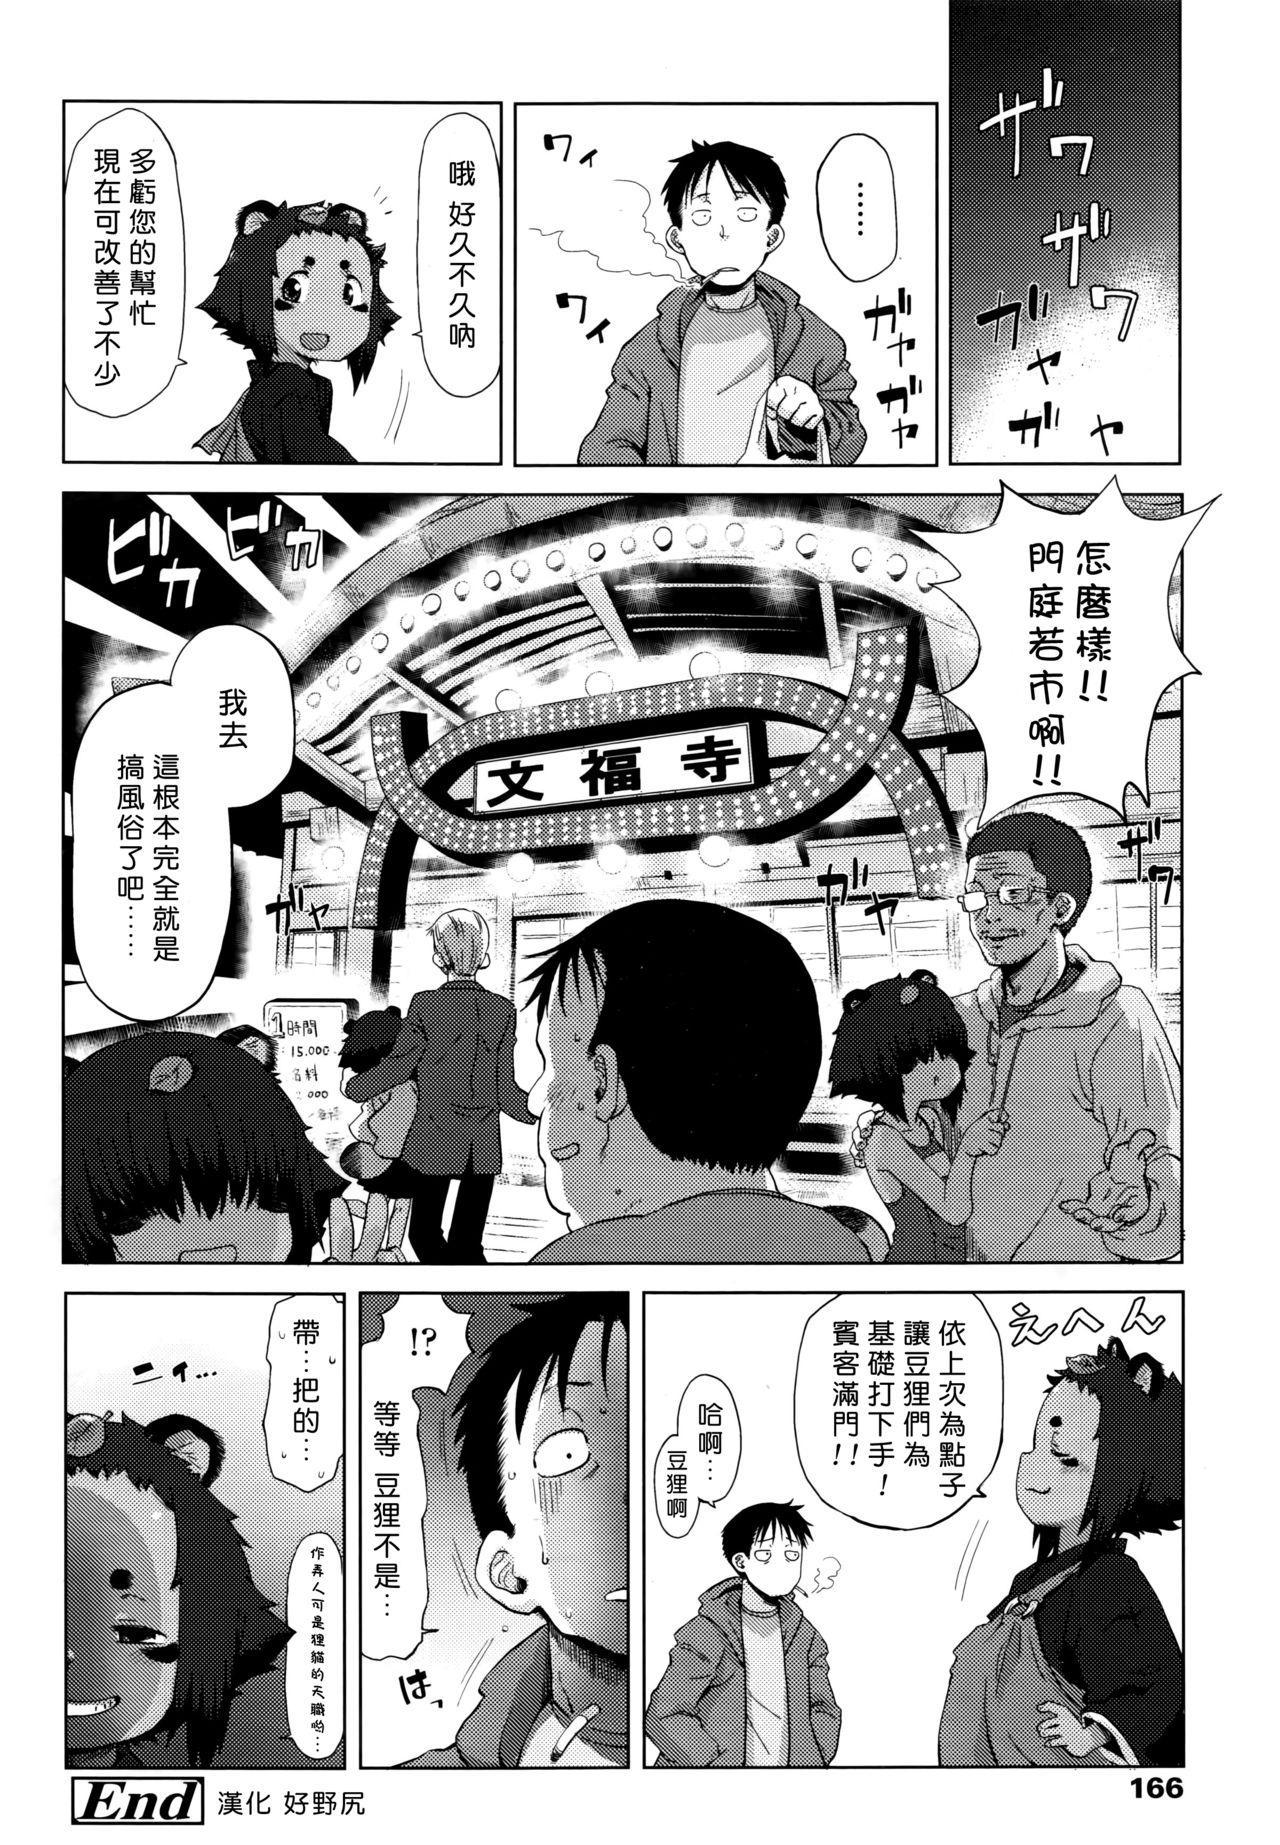 Rojiura Tanuki no Kawazanyou 21